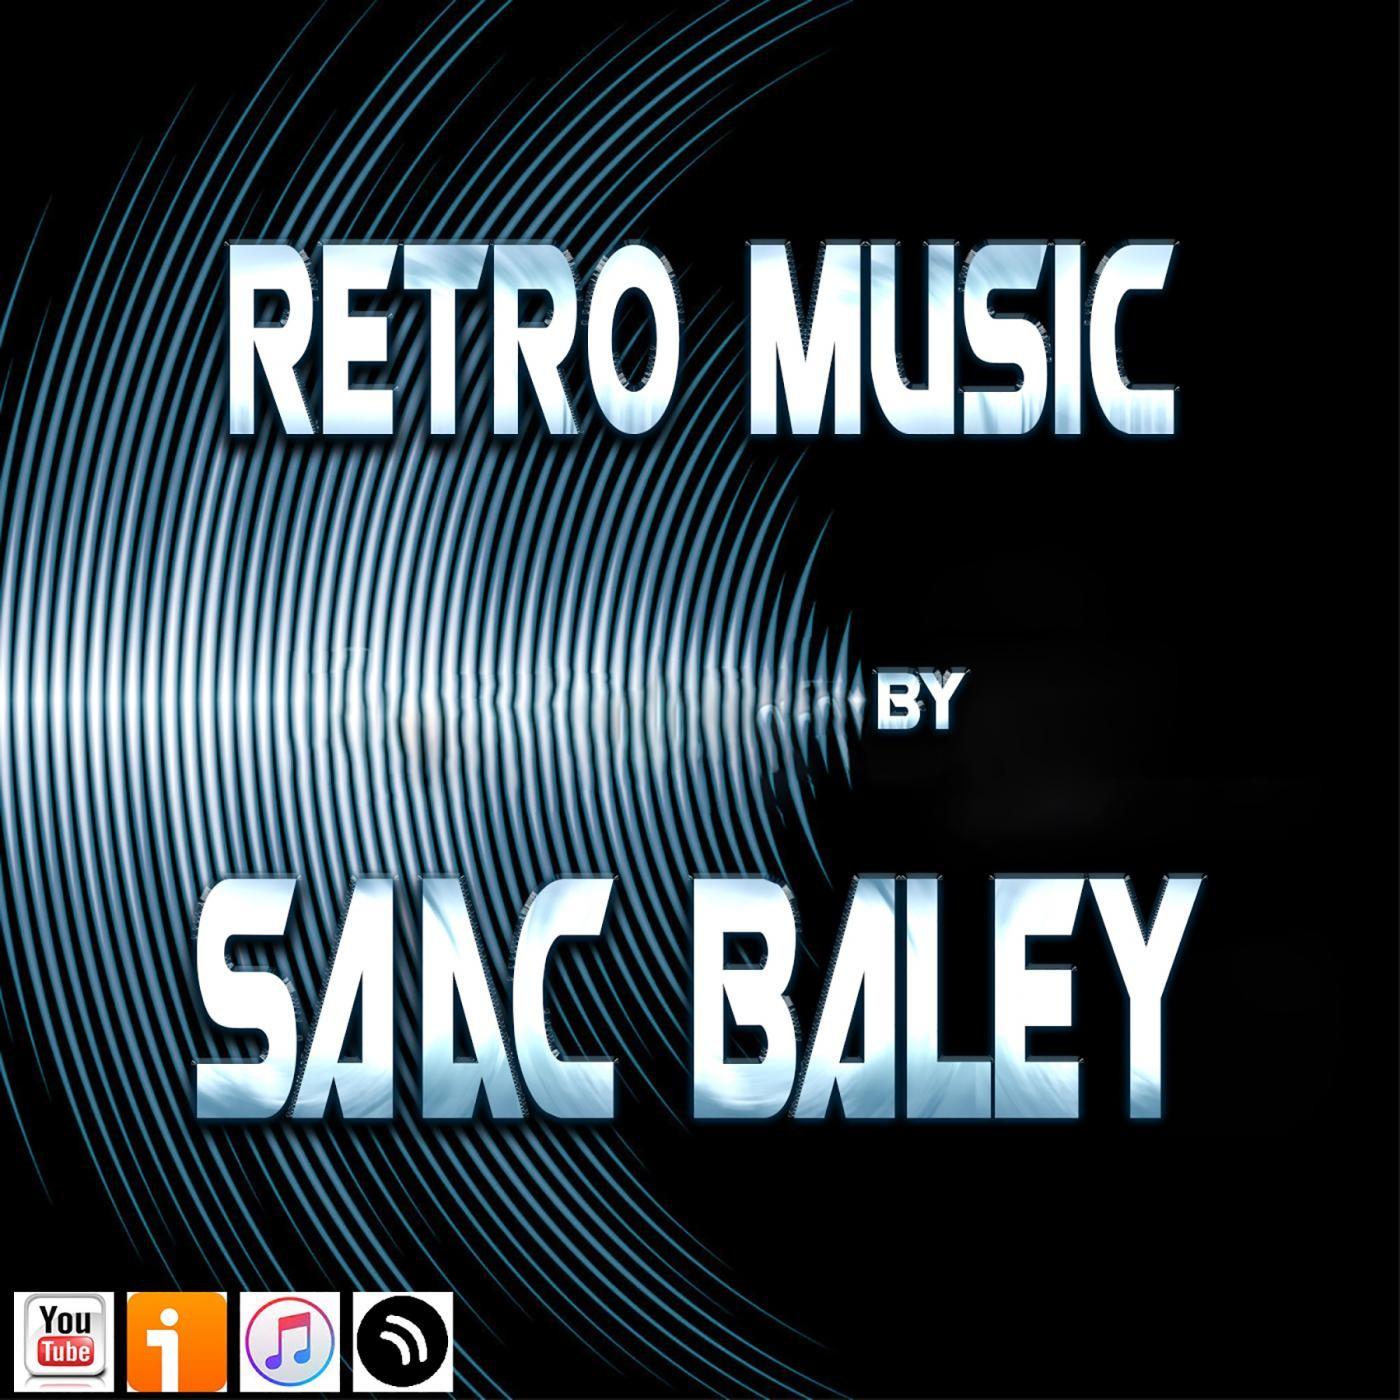 <![CDATA[Retro Music by Saac Baley]]>